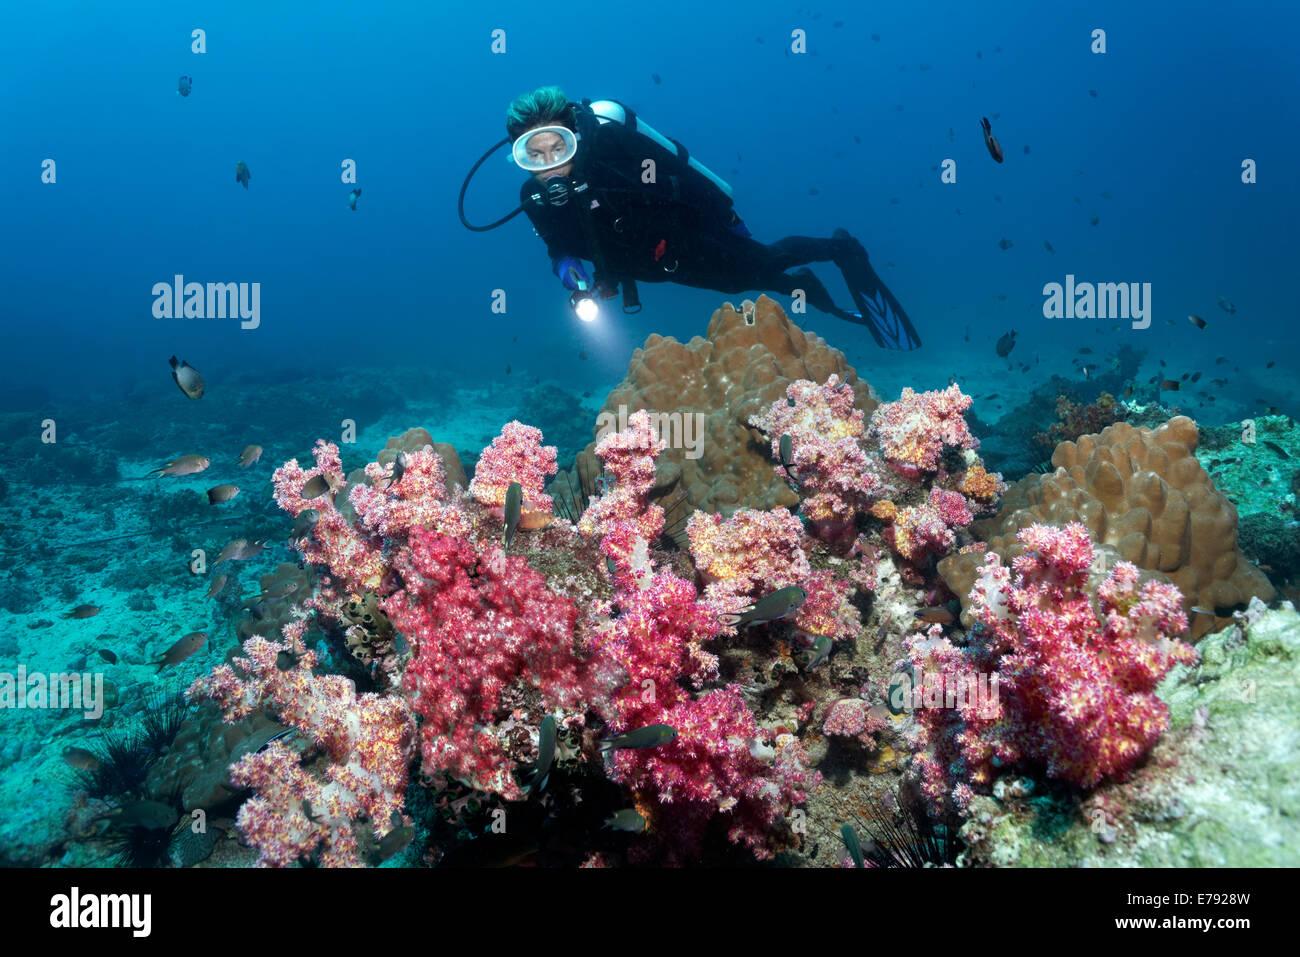 Various soft corals and hard corals, a diver at the back, Dimaniyat Islands nature reserve, Al Batinah region, Oman - Stock Image